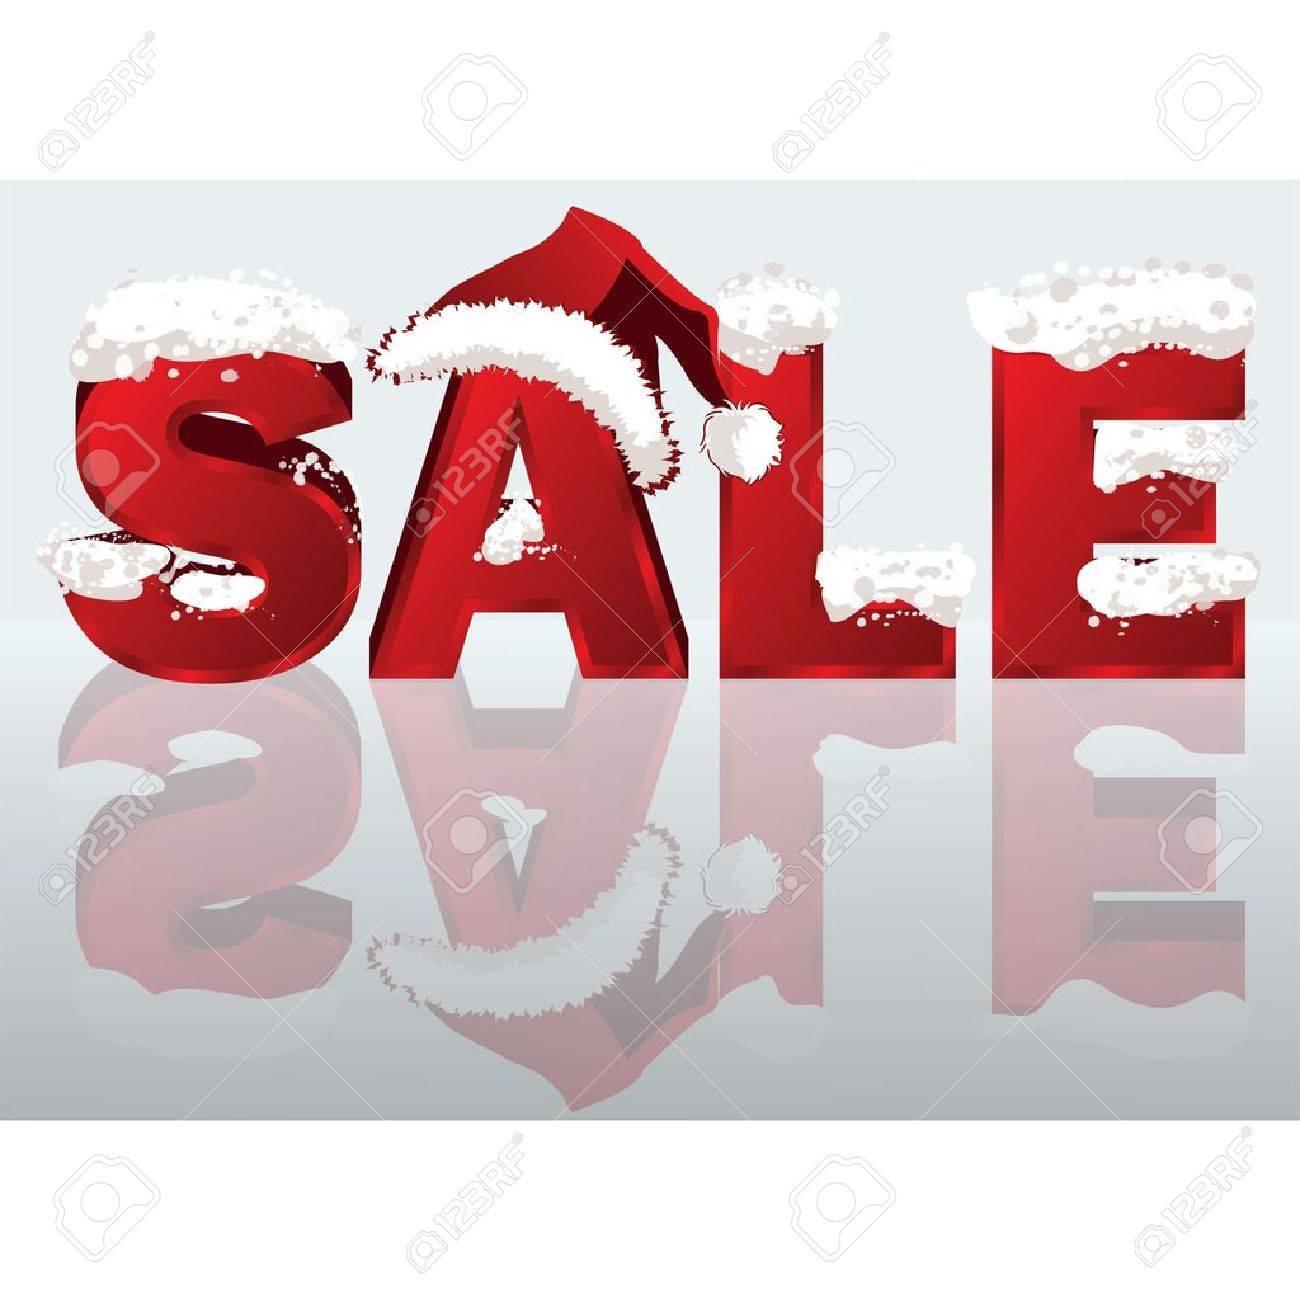 Winter sale banner in 3D image. vector illustration Stock Vector - 8543032